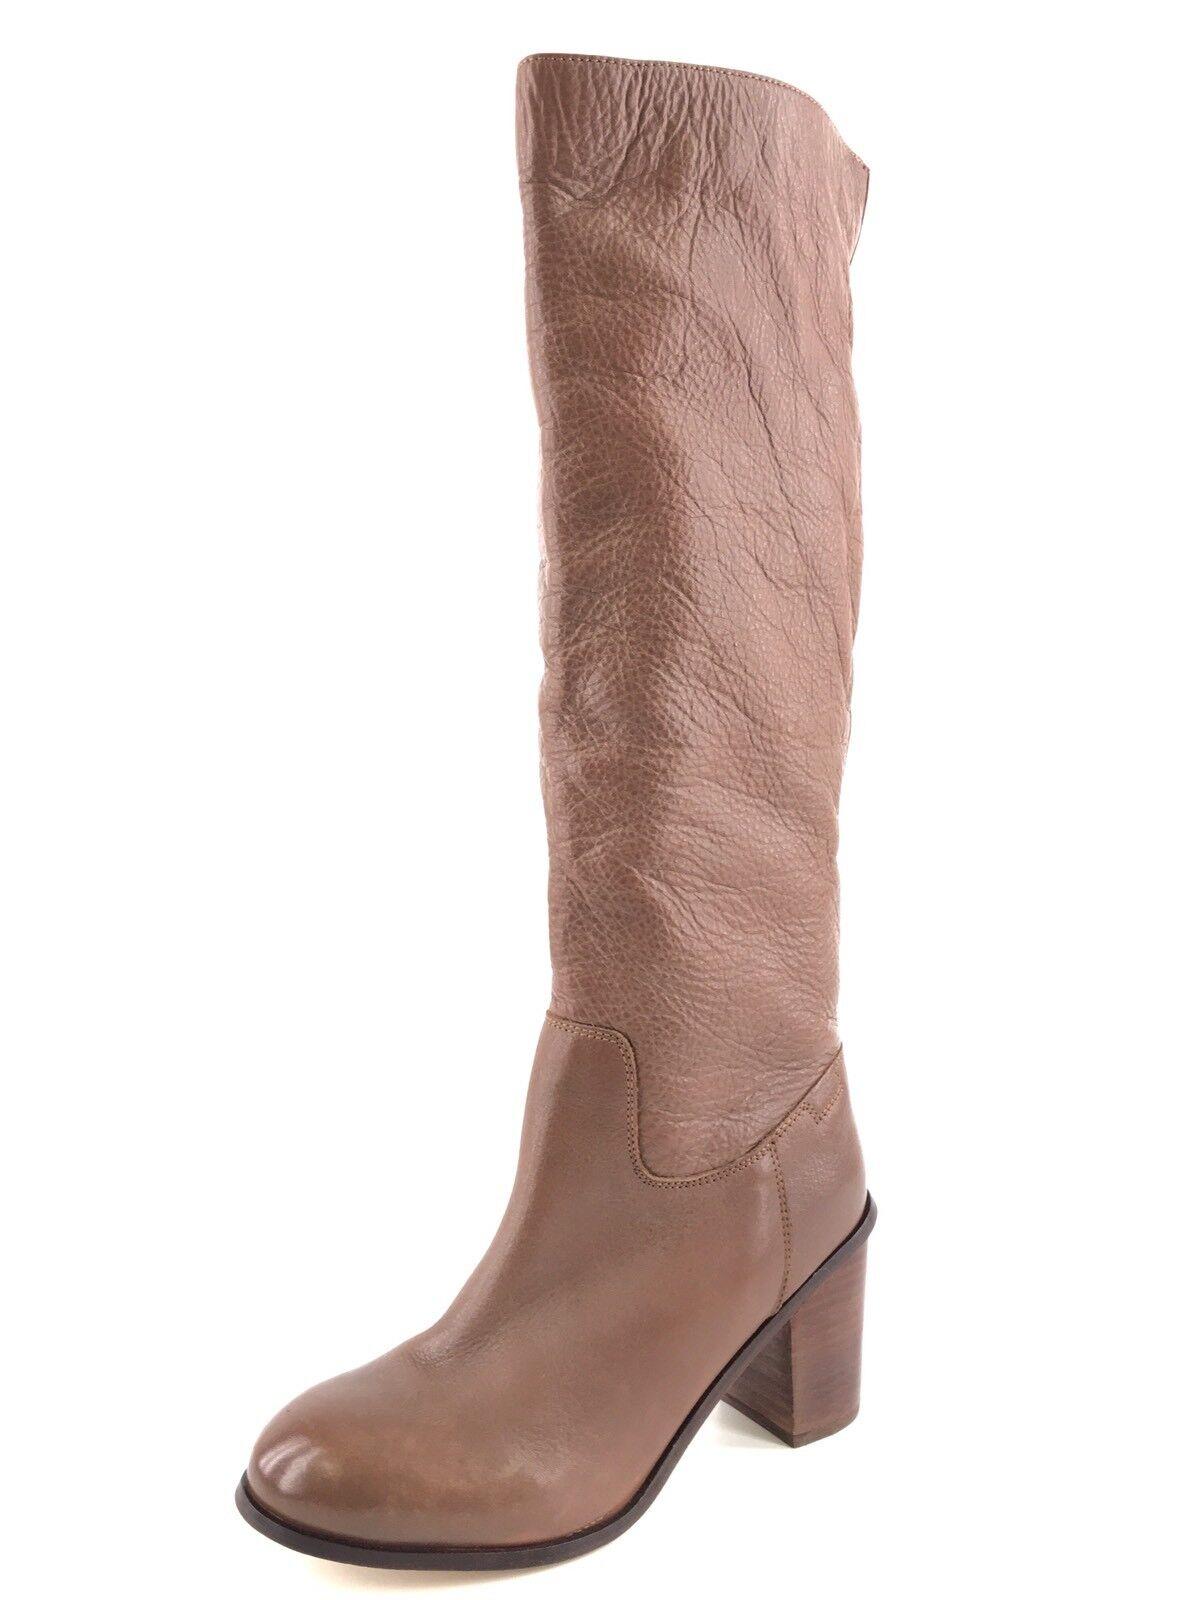 prima i clienti Seychelles Obsidian Marrone Leather Knee High stivali Donna Donna Donna  Dimensione 9 M  outlet